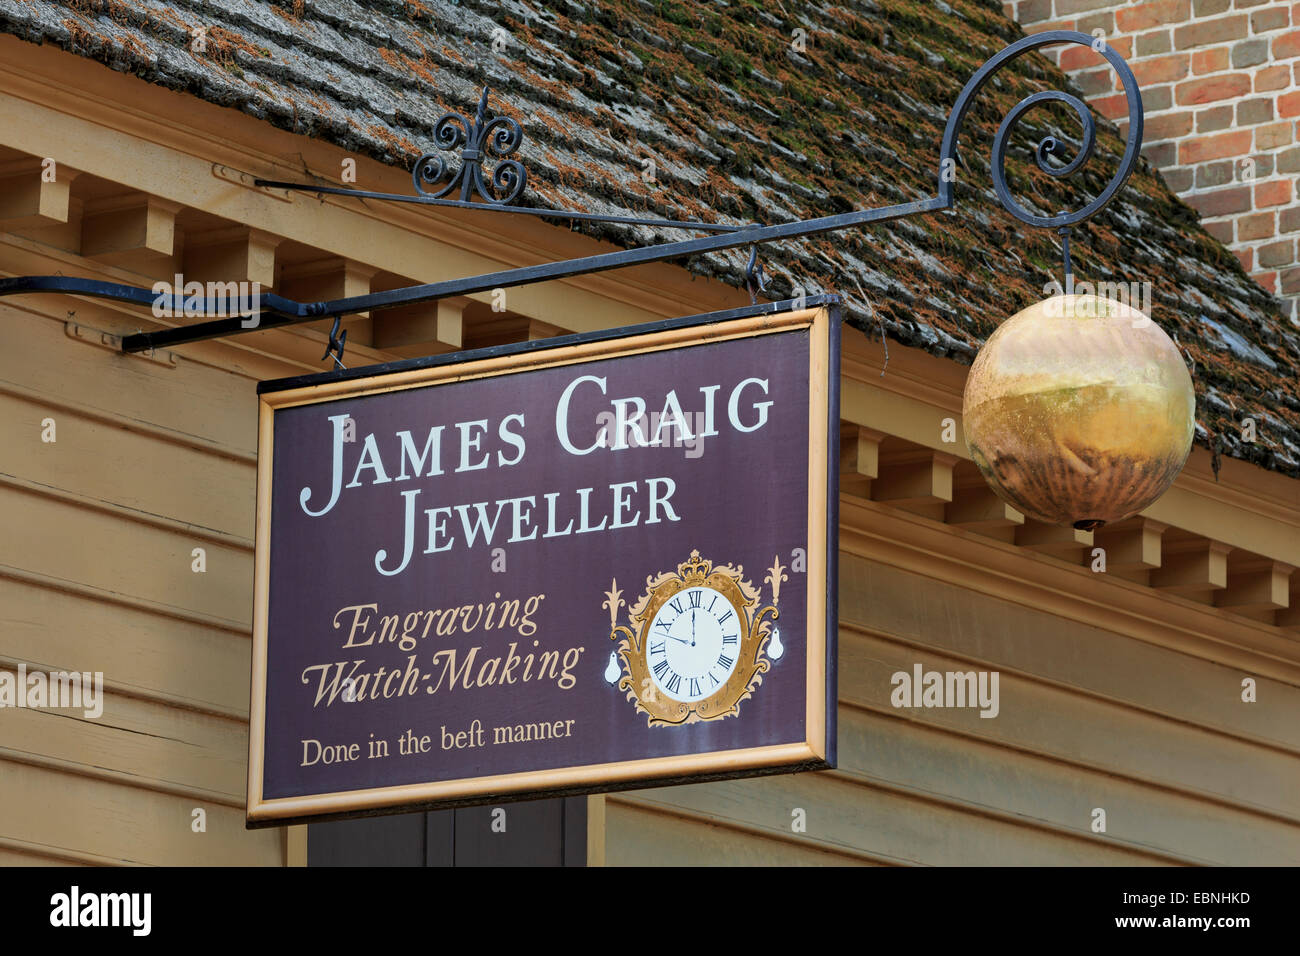 Jeweller in Colonial Williamsburg, Virginia, USA - Stock Image